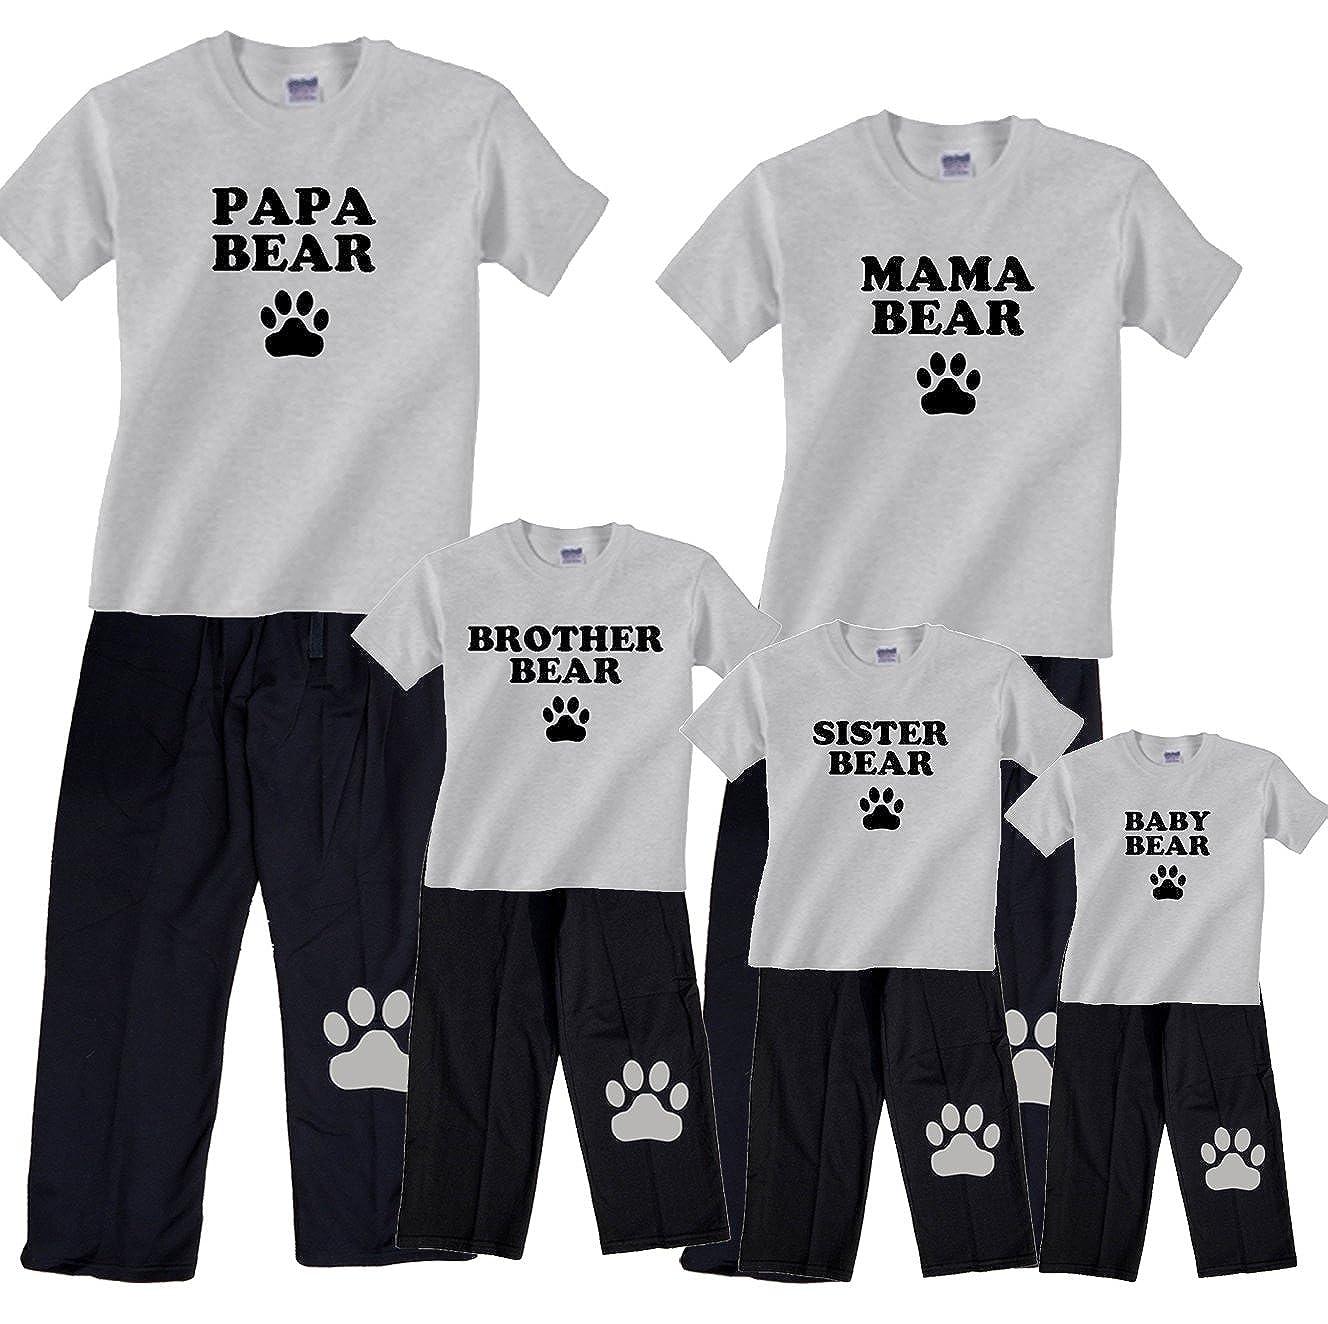 4ec0d5f7c2 Amazon.com  Bear Family Matching Pajamas   Kids Clothing Sets - Mama Bear